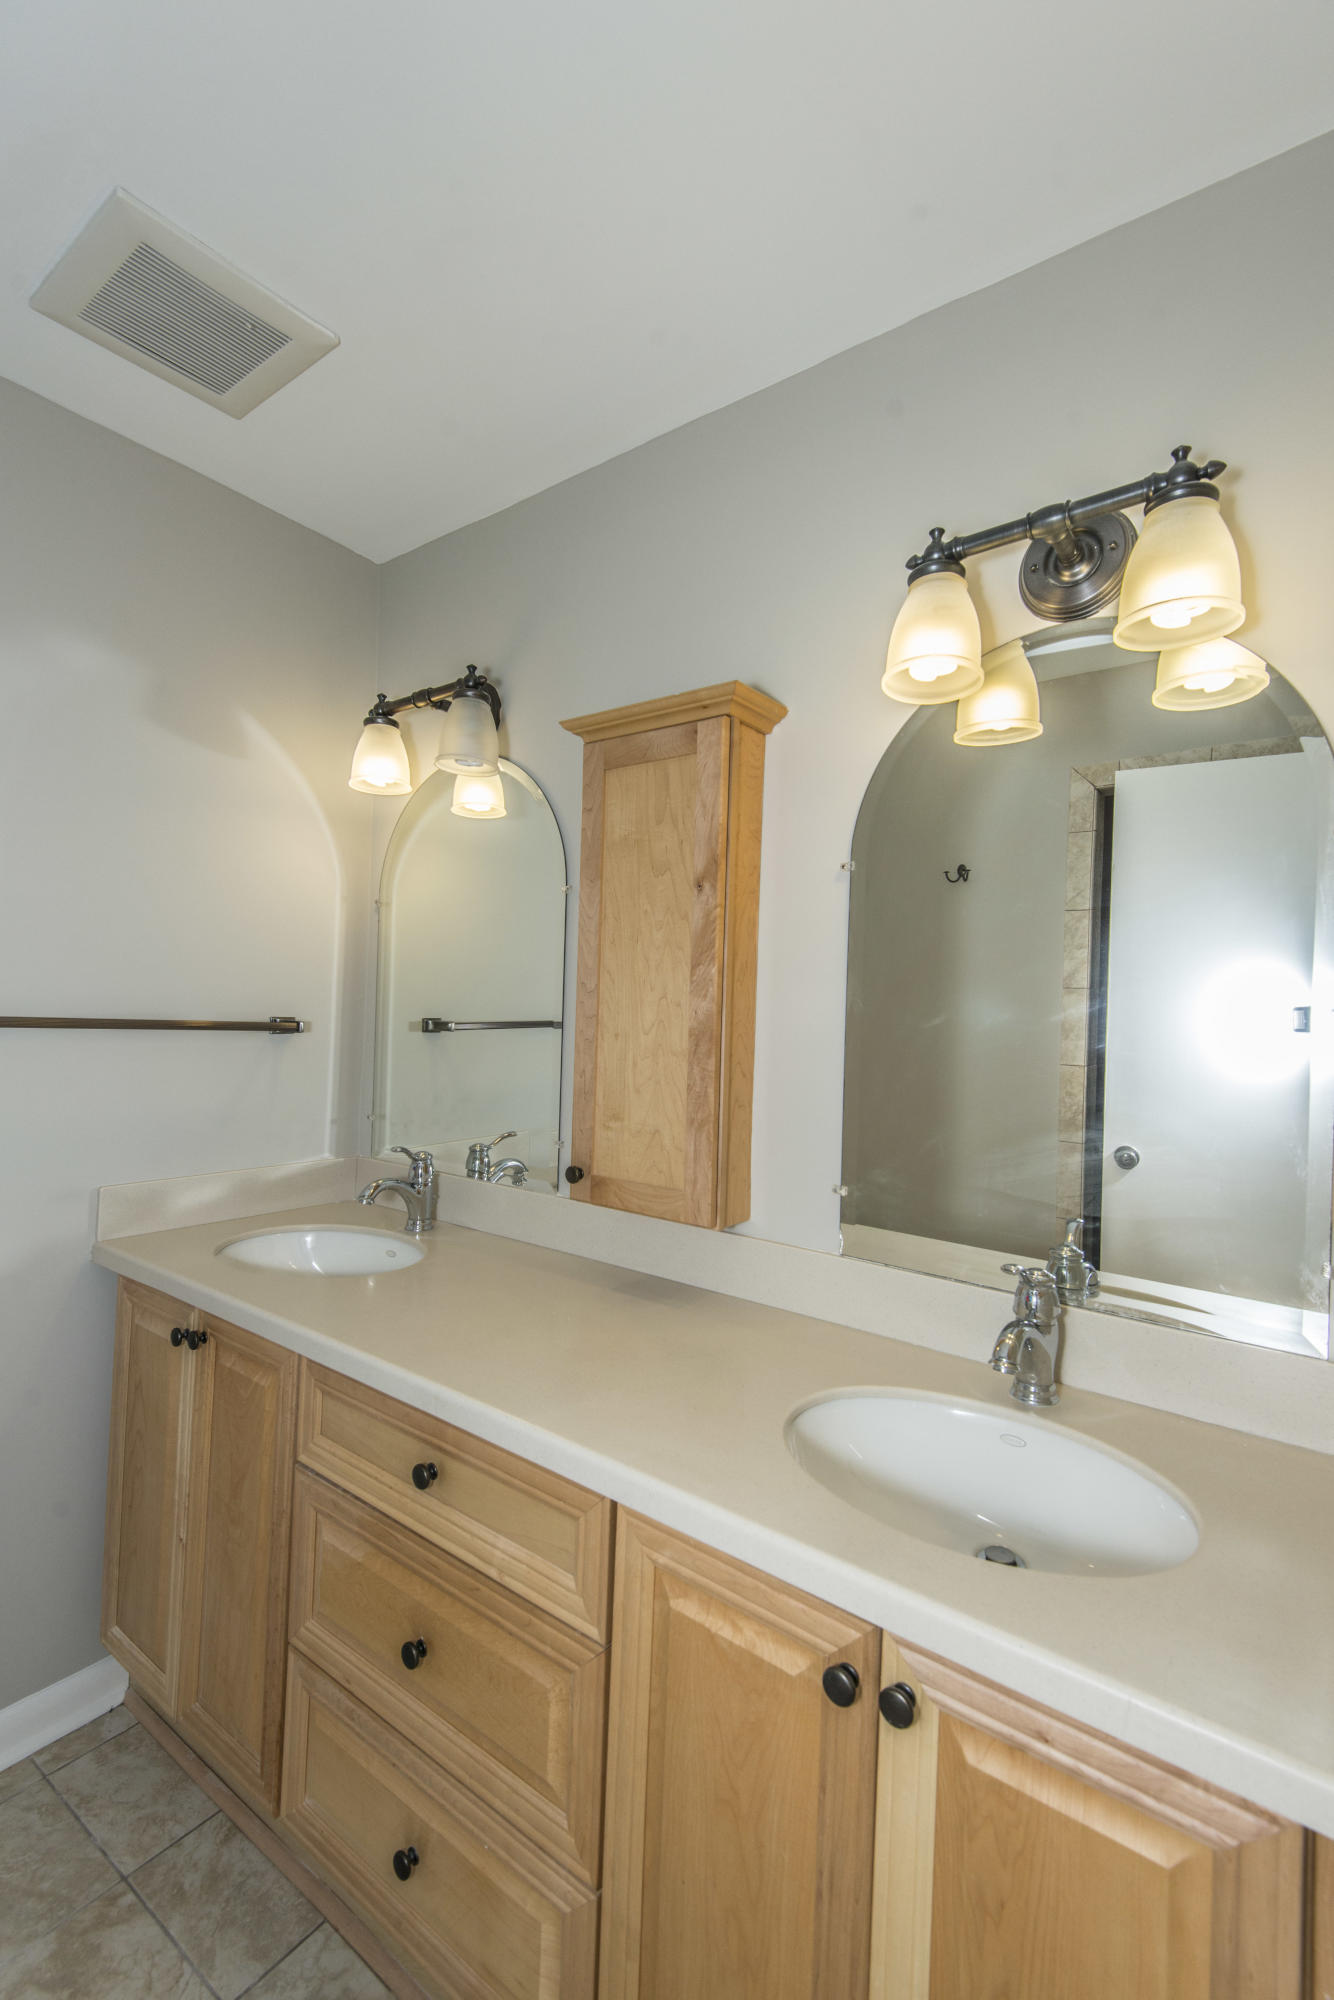 Middlewoods East Homes For Sale - 135 Conifer, Kiawah Island, SC - 4